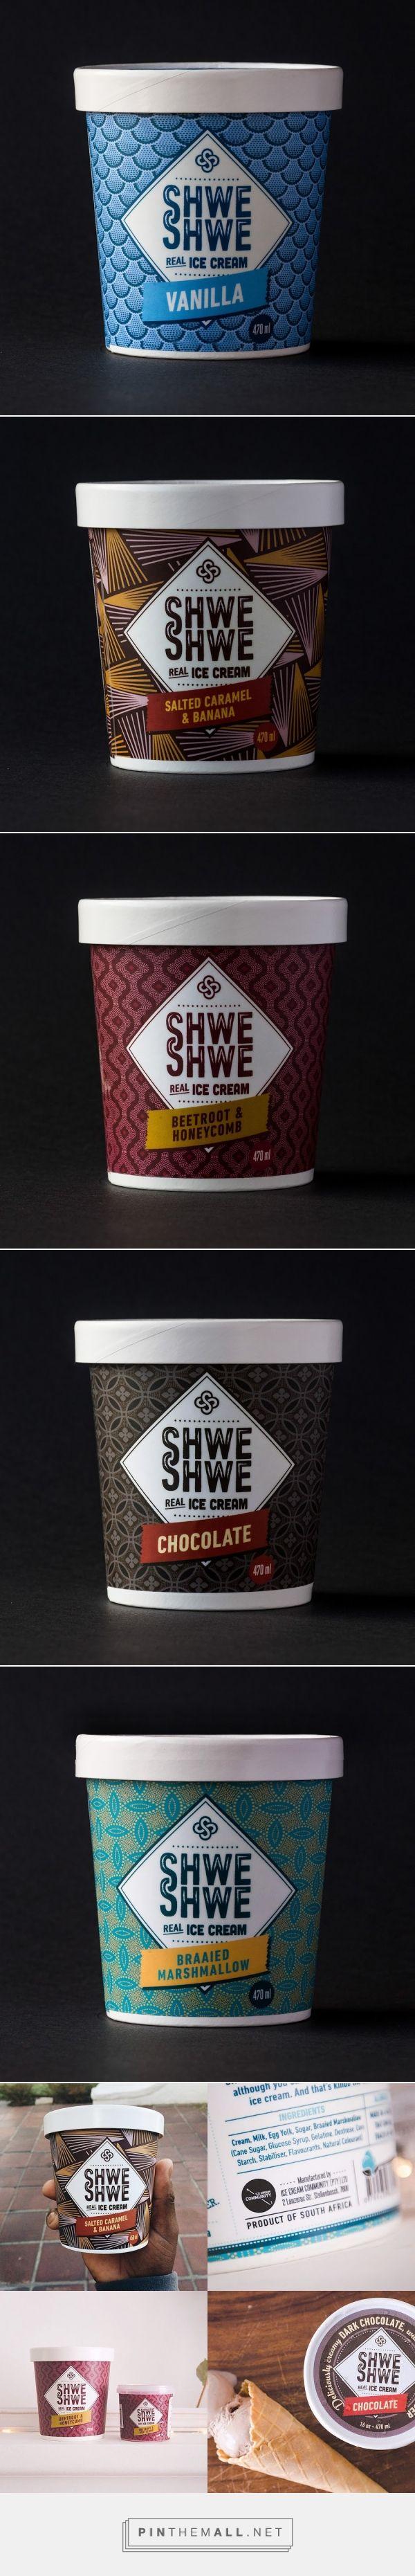 Shwe Shwe - Packaging of the World - Creative Package Design Gallery - http://www.packagingoftheworld.com/2016/06/shwe-shwe.html